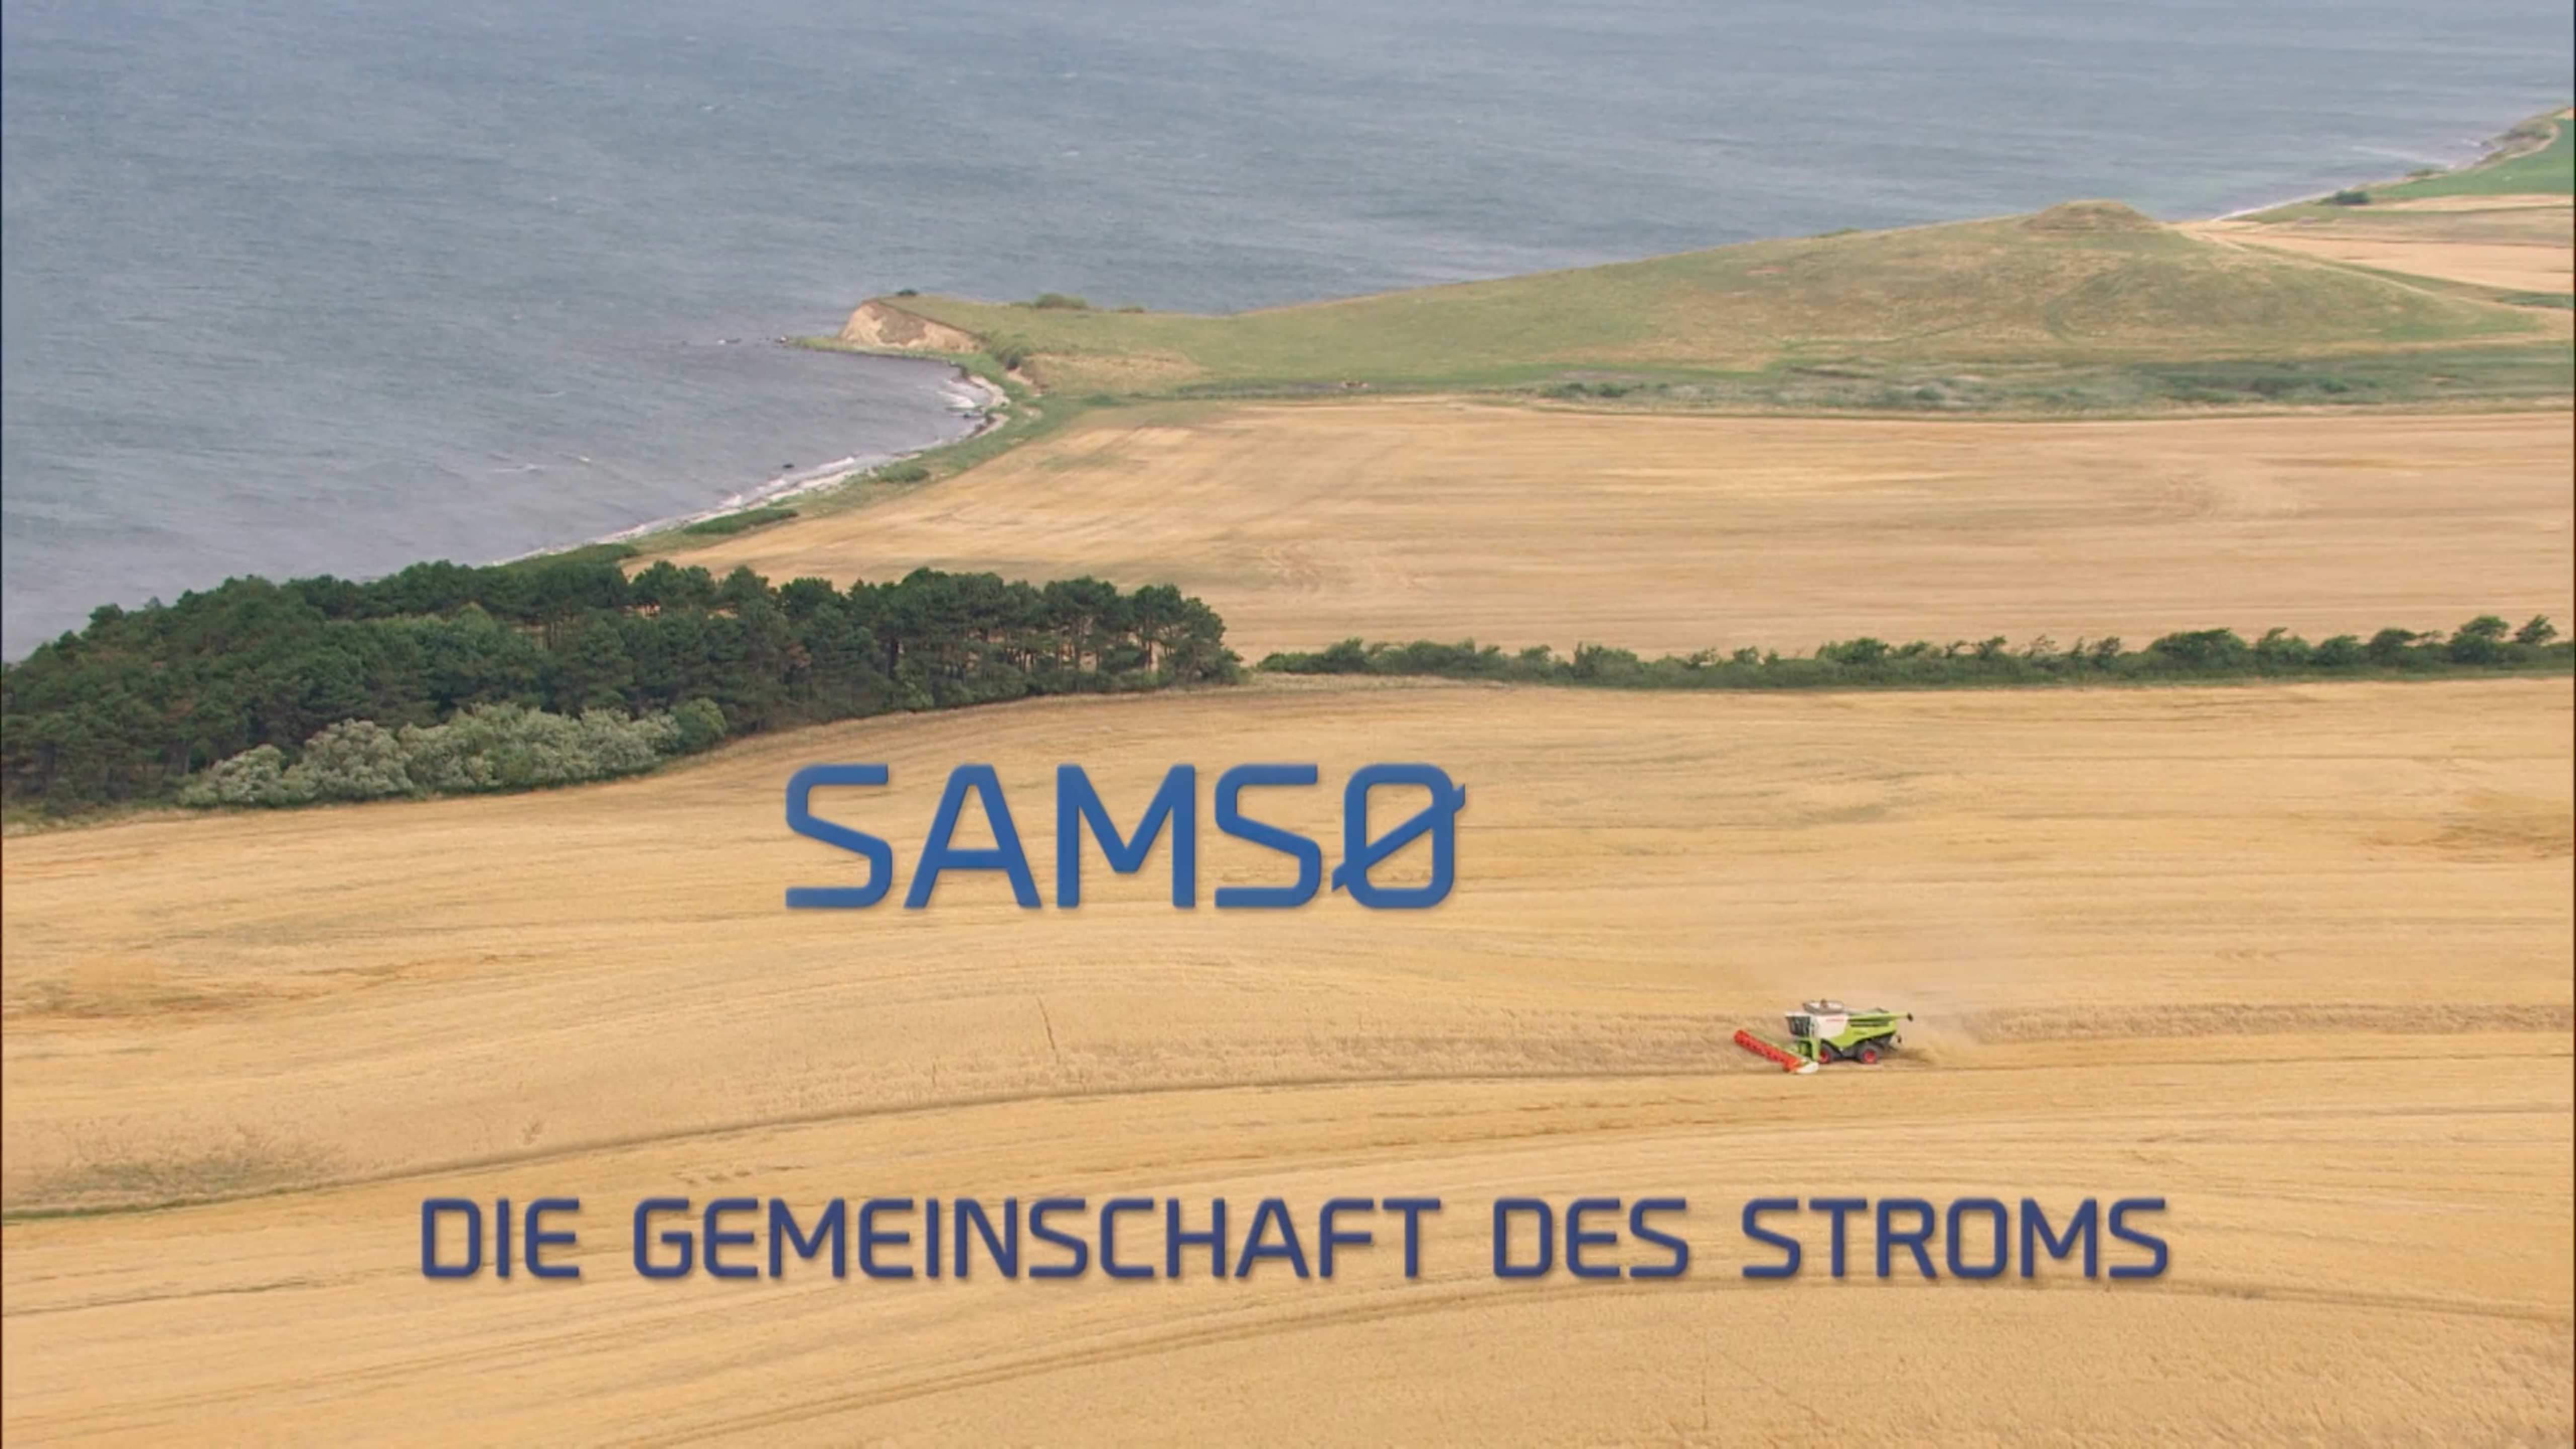 Samso Insel der Zukunft